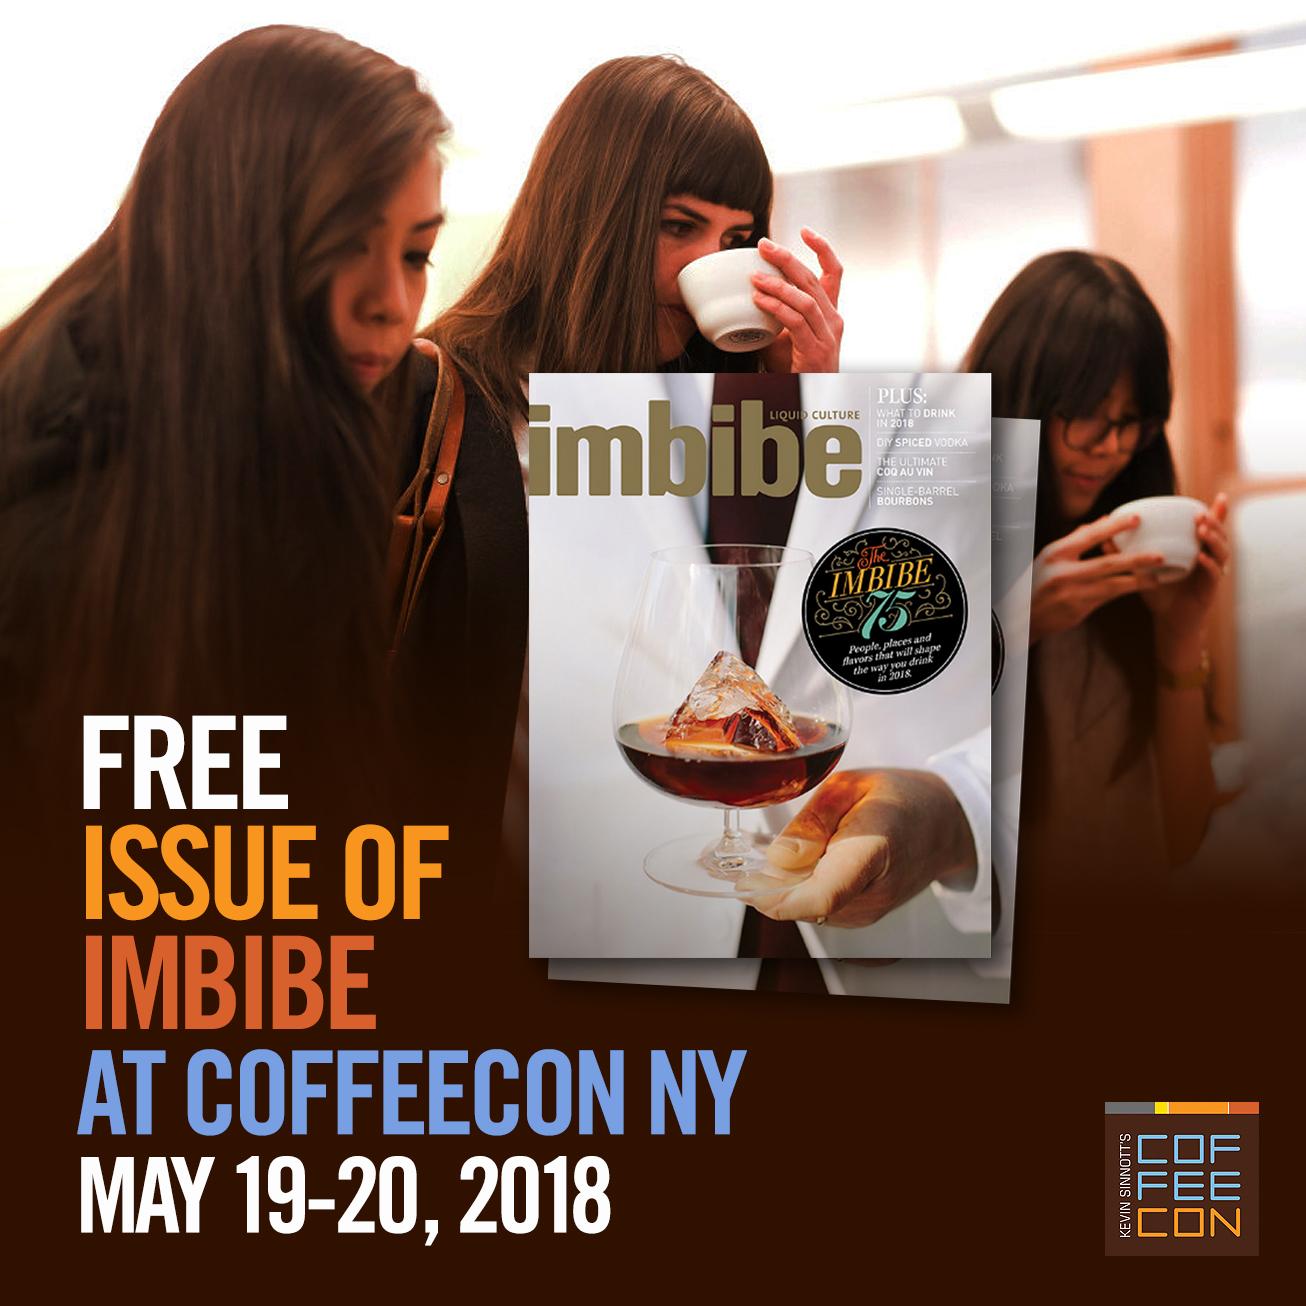 Free Issue of Imbibe Magazine at CoffeeConNY